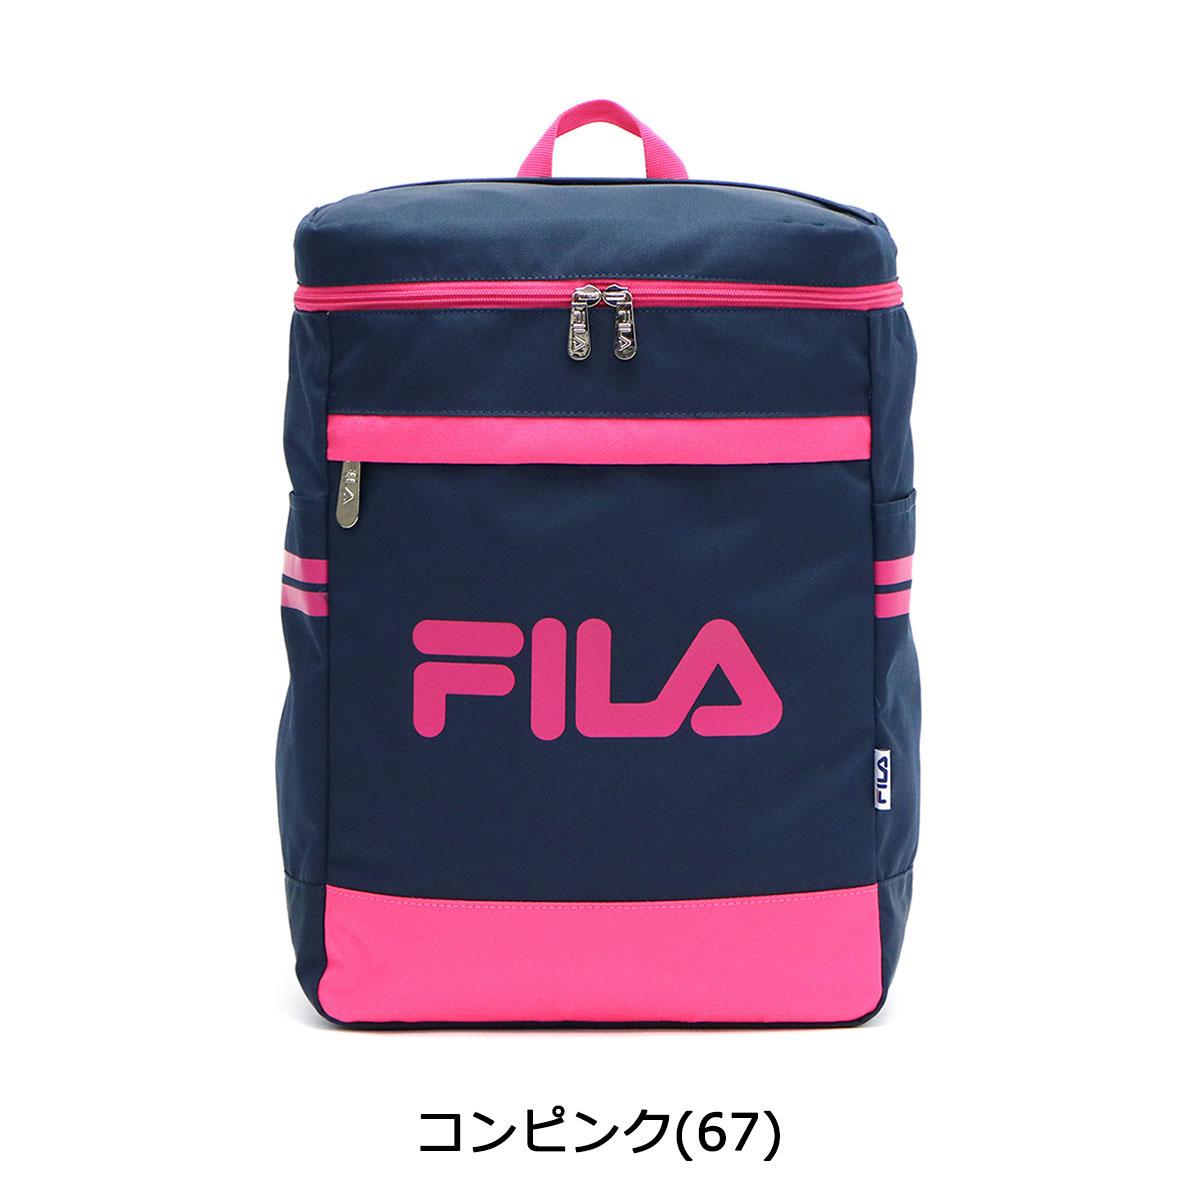 39c9c1806c ... FILA backpack FILA rucksack star rush daypack commuting club sports school  bag school bag school bag ...